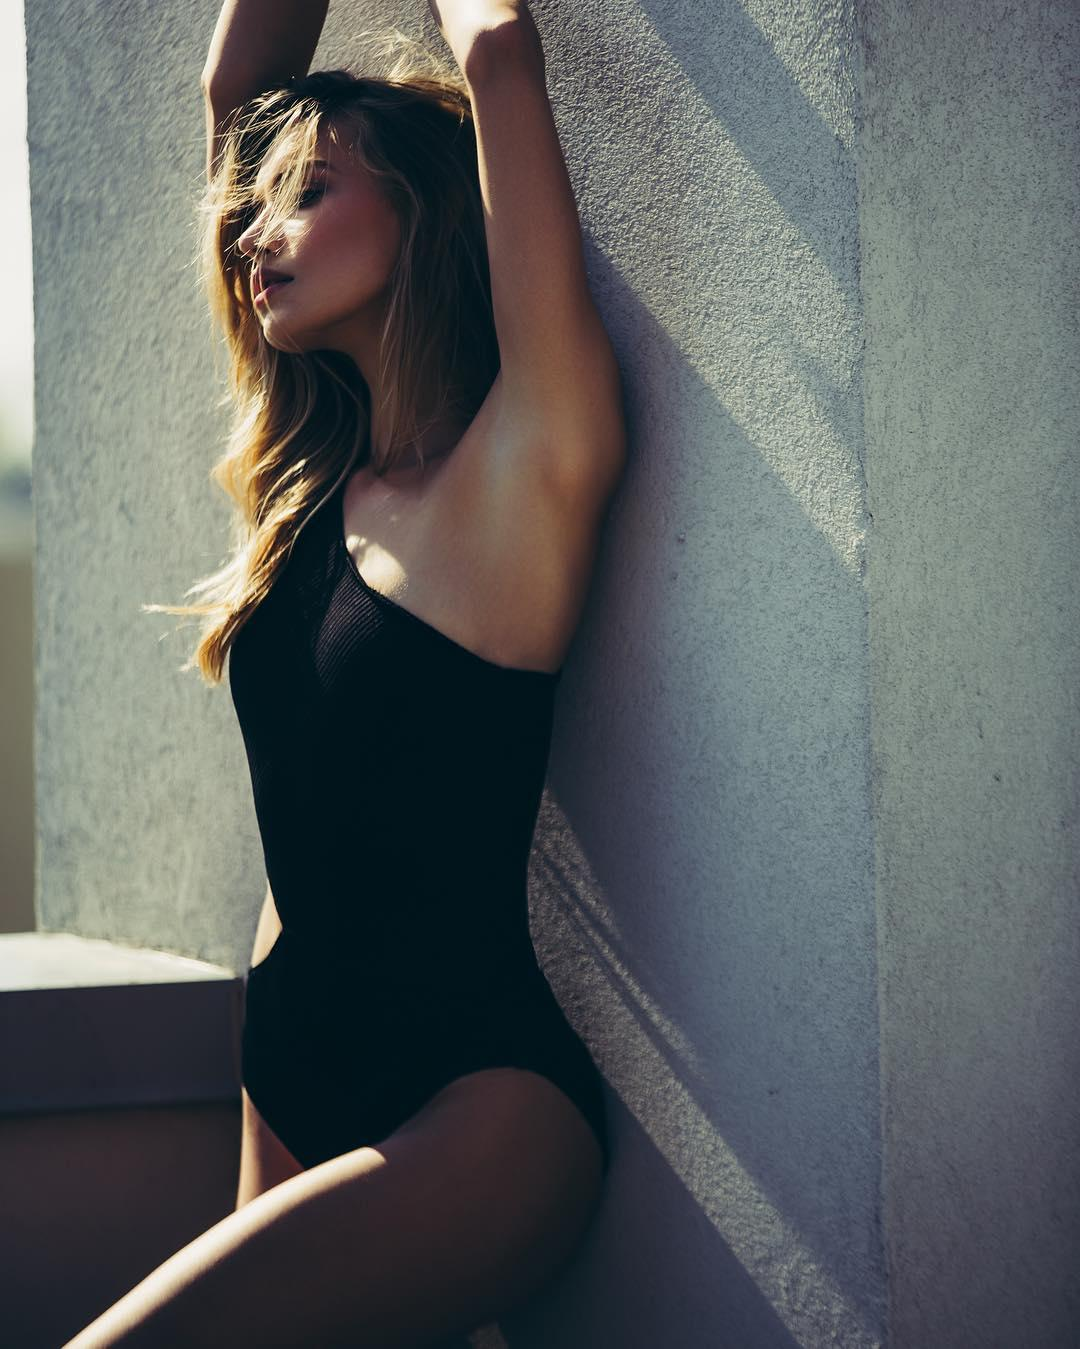 Feet Meri Gulin naked (35 photos), Topless, Paparazzi, Selfie, panties 2020